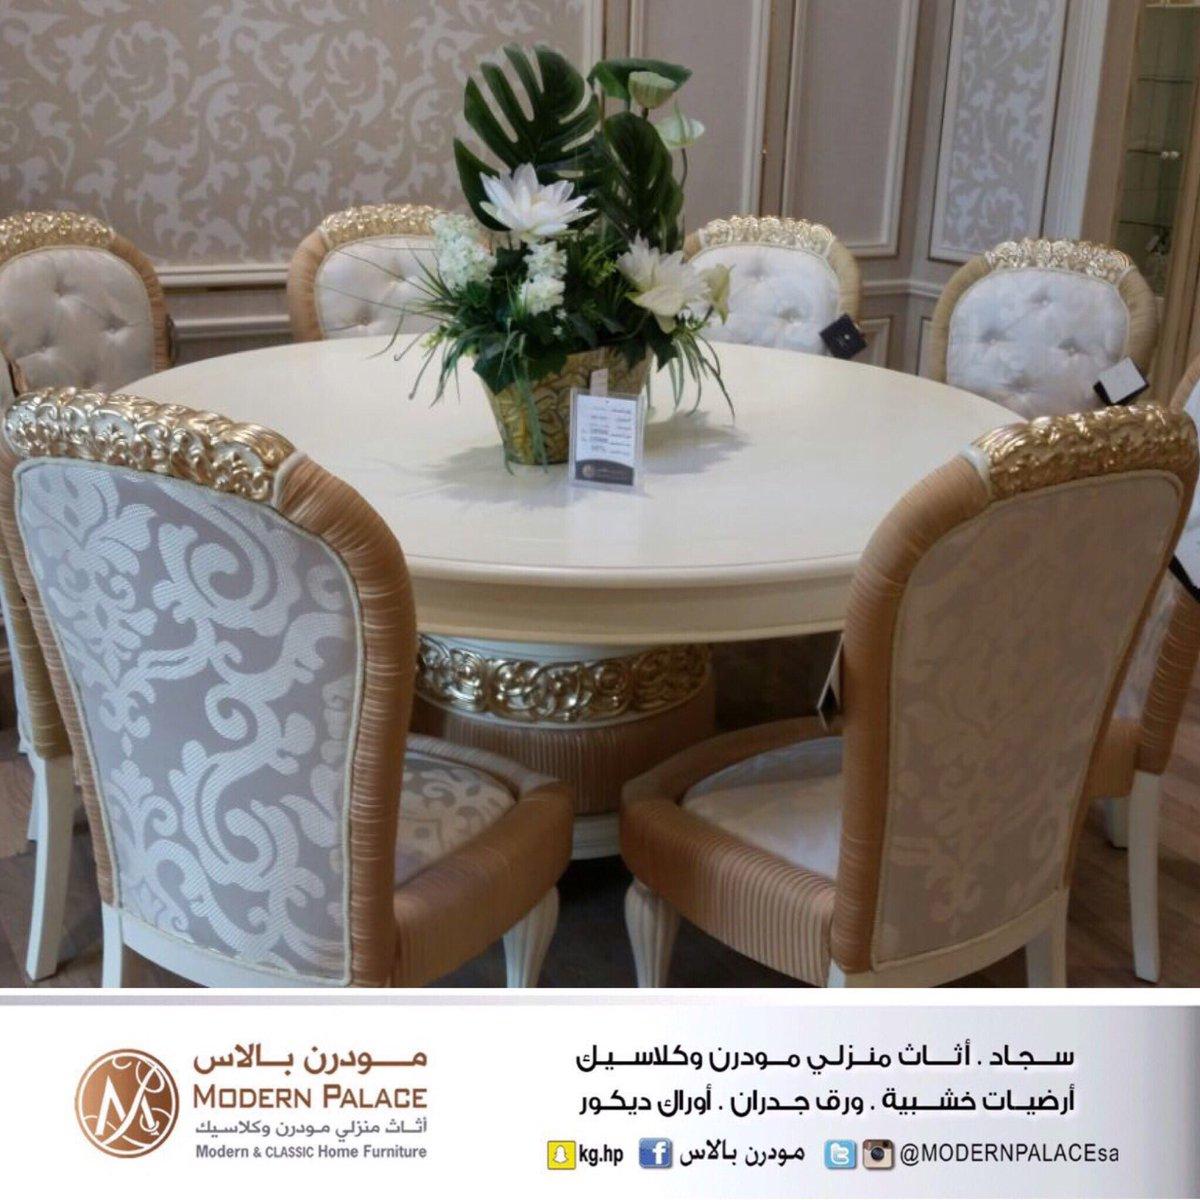 طاولة طعام مودرن from pbs.twimg.com